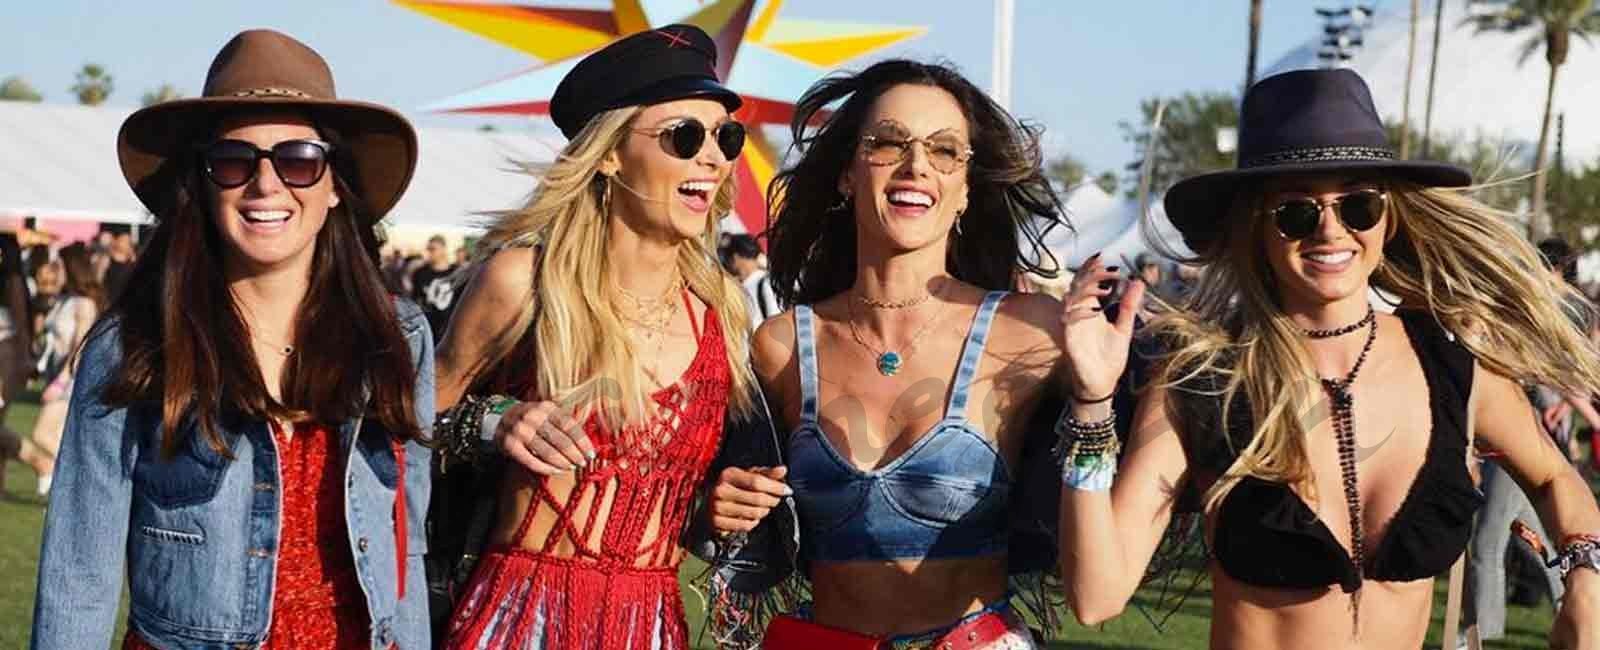 Los mejores looks street style de Coachella